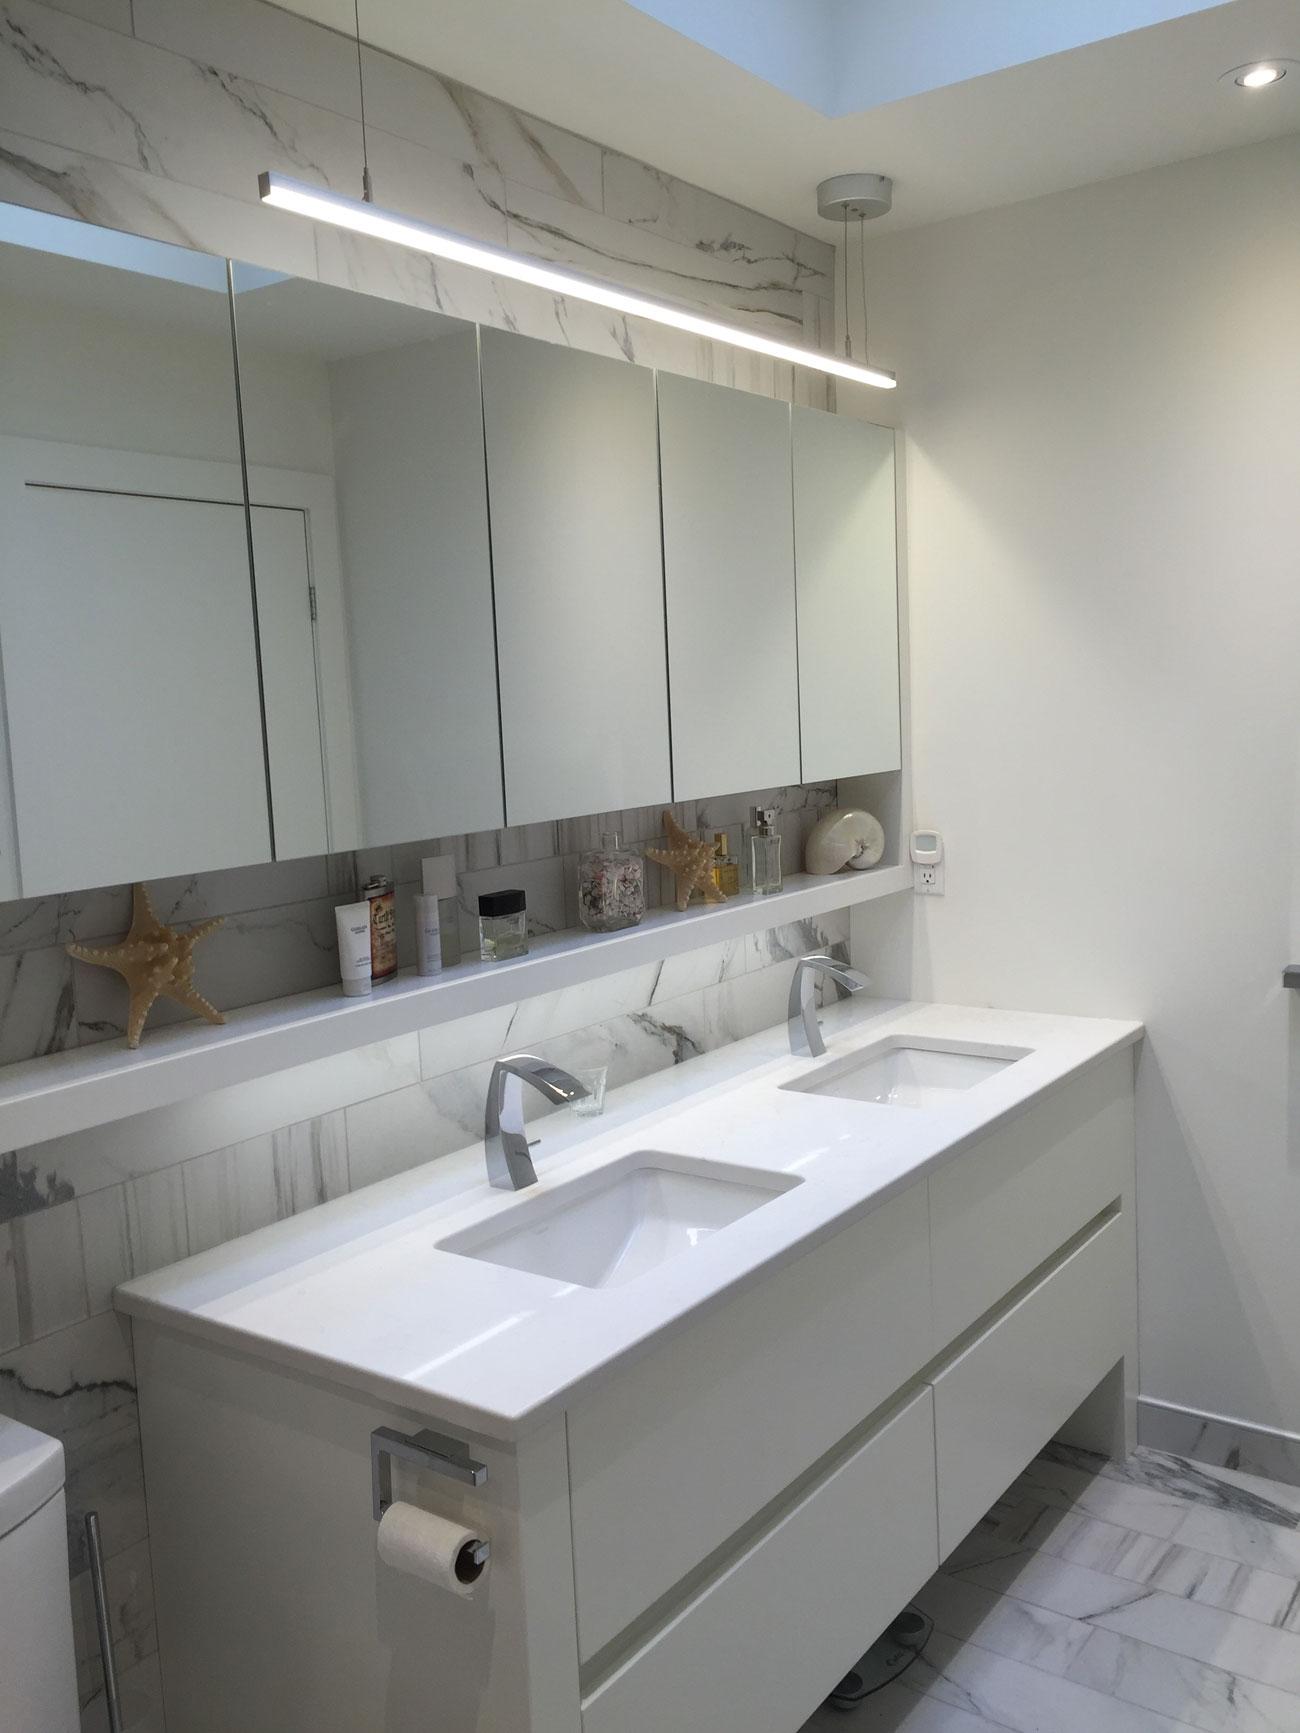 Zone cuisines salles de bain for Zone salle de bain